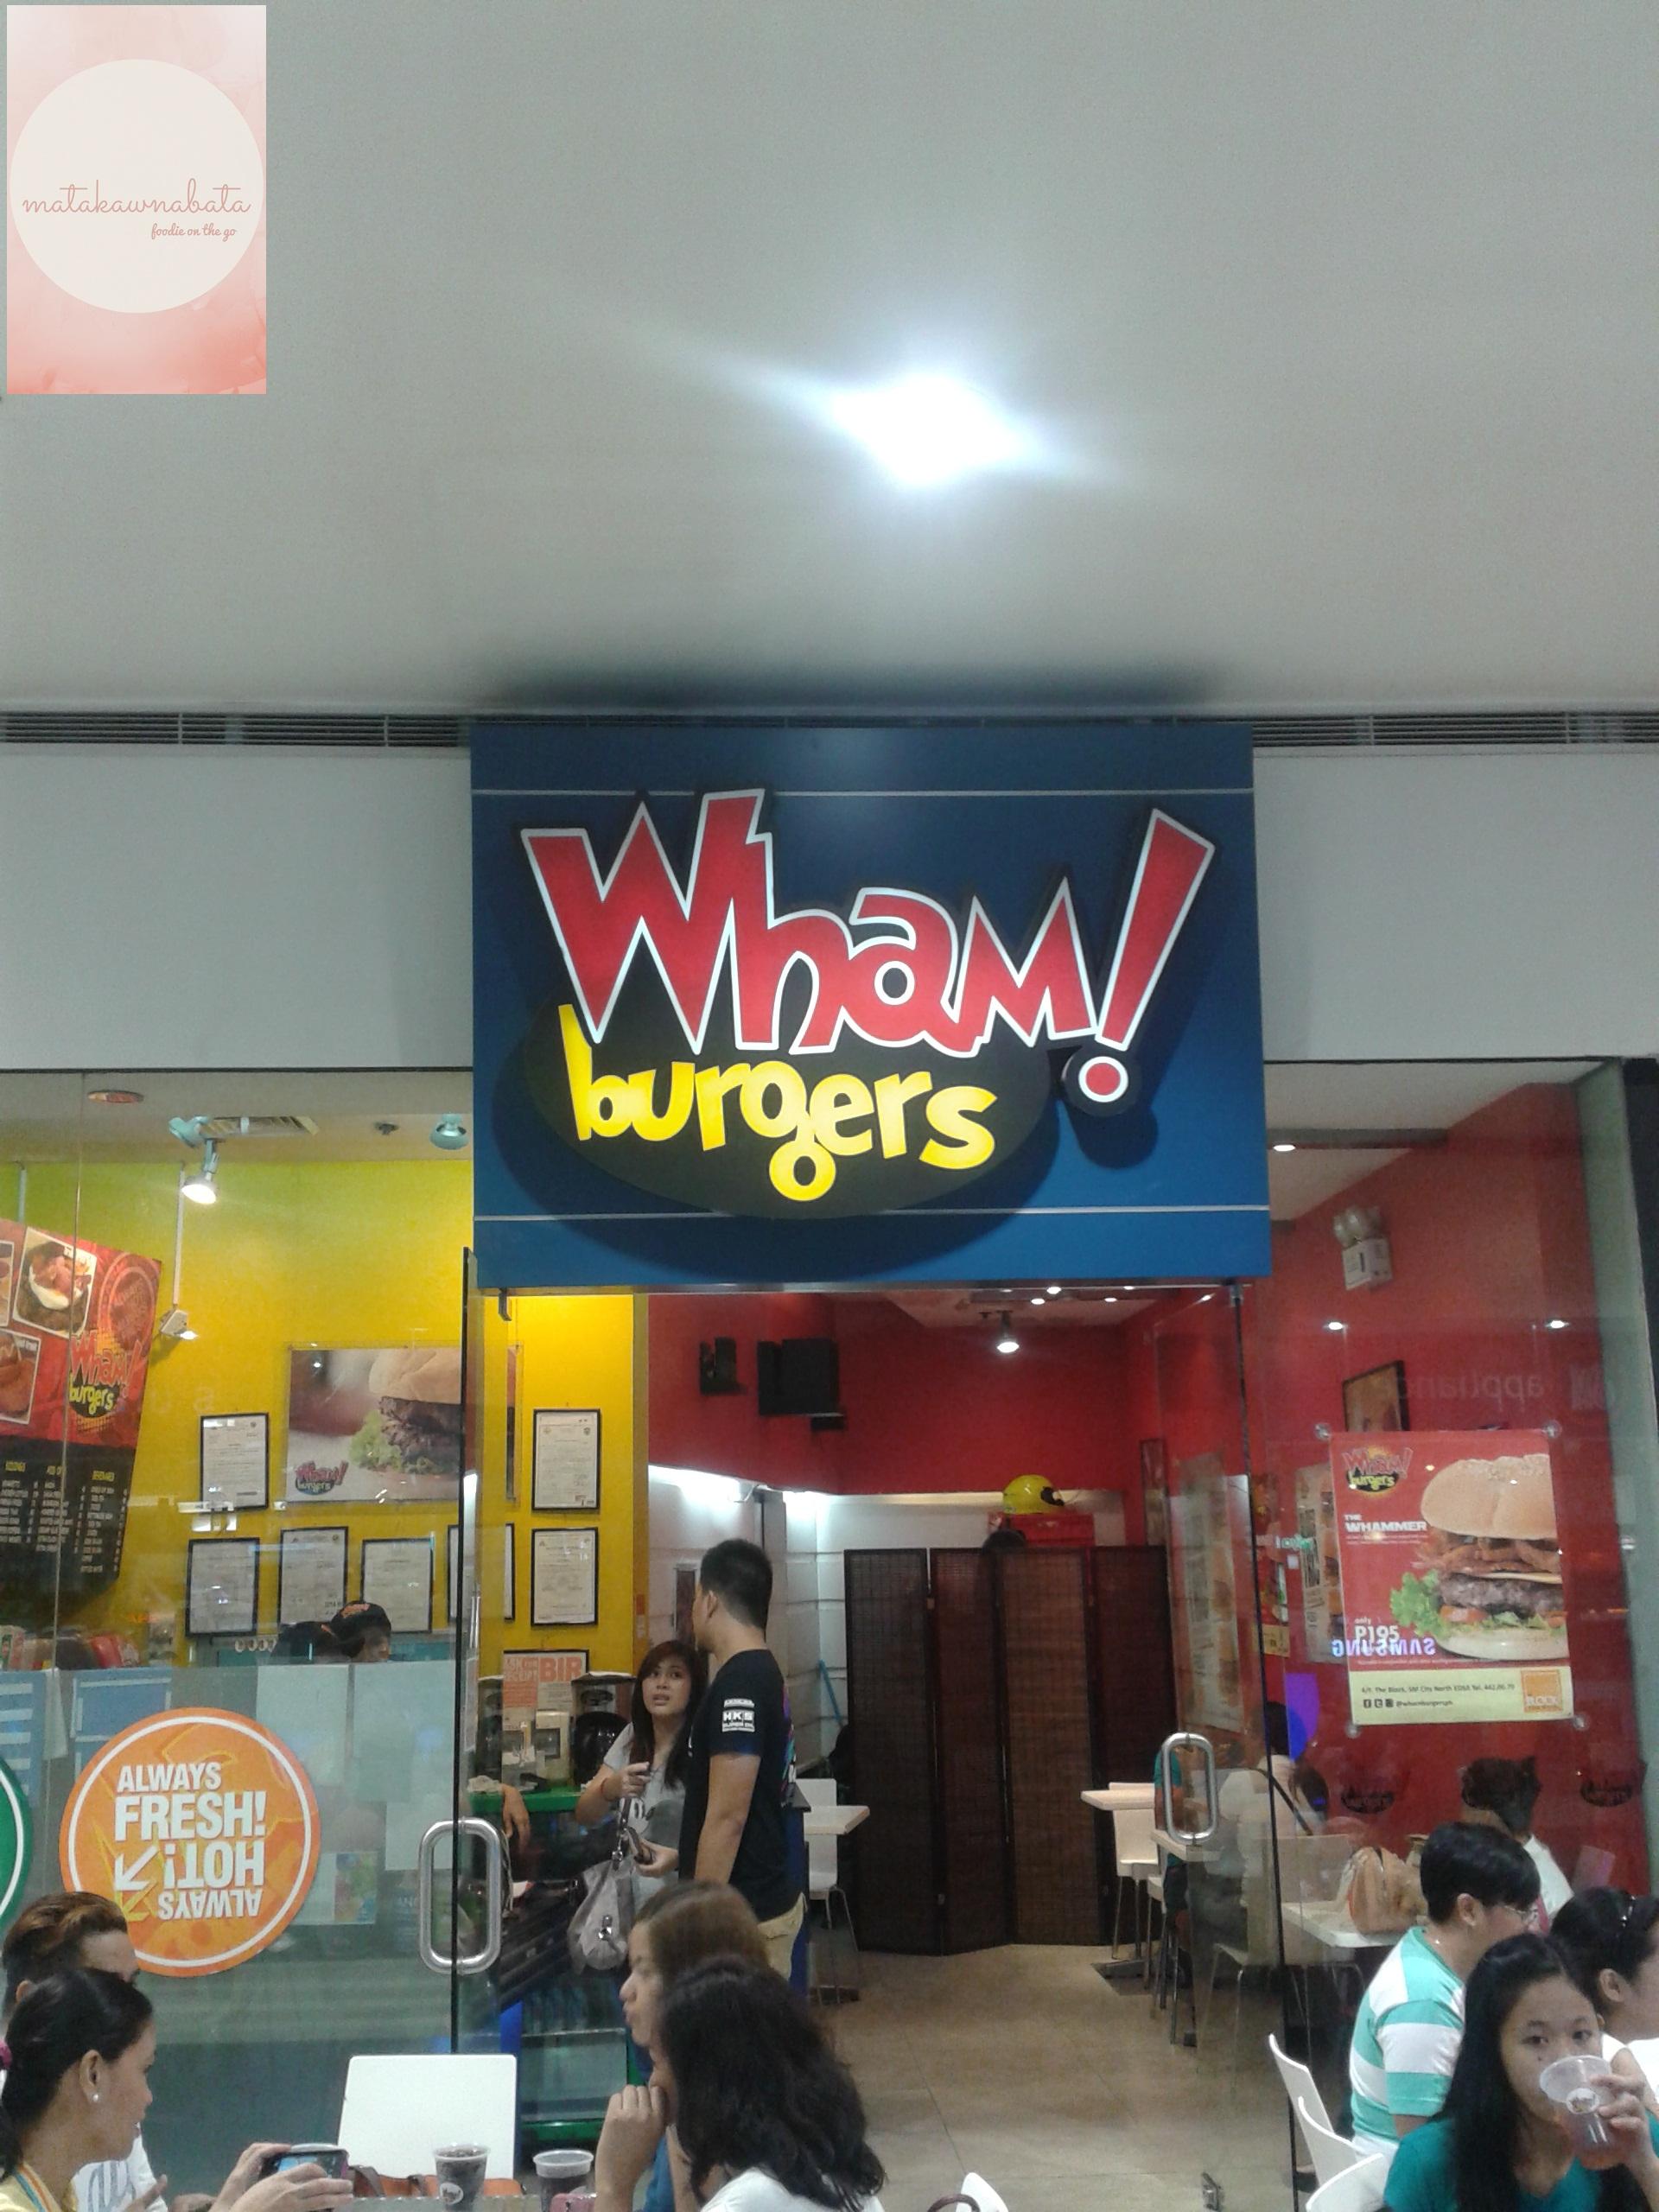 My Wham! Burgers experience